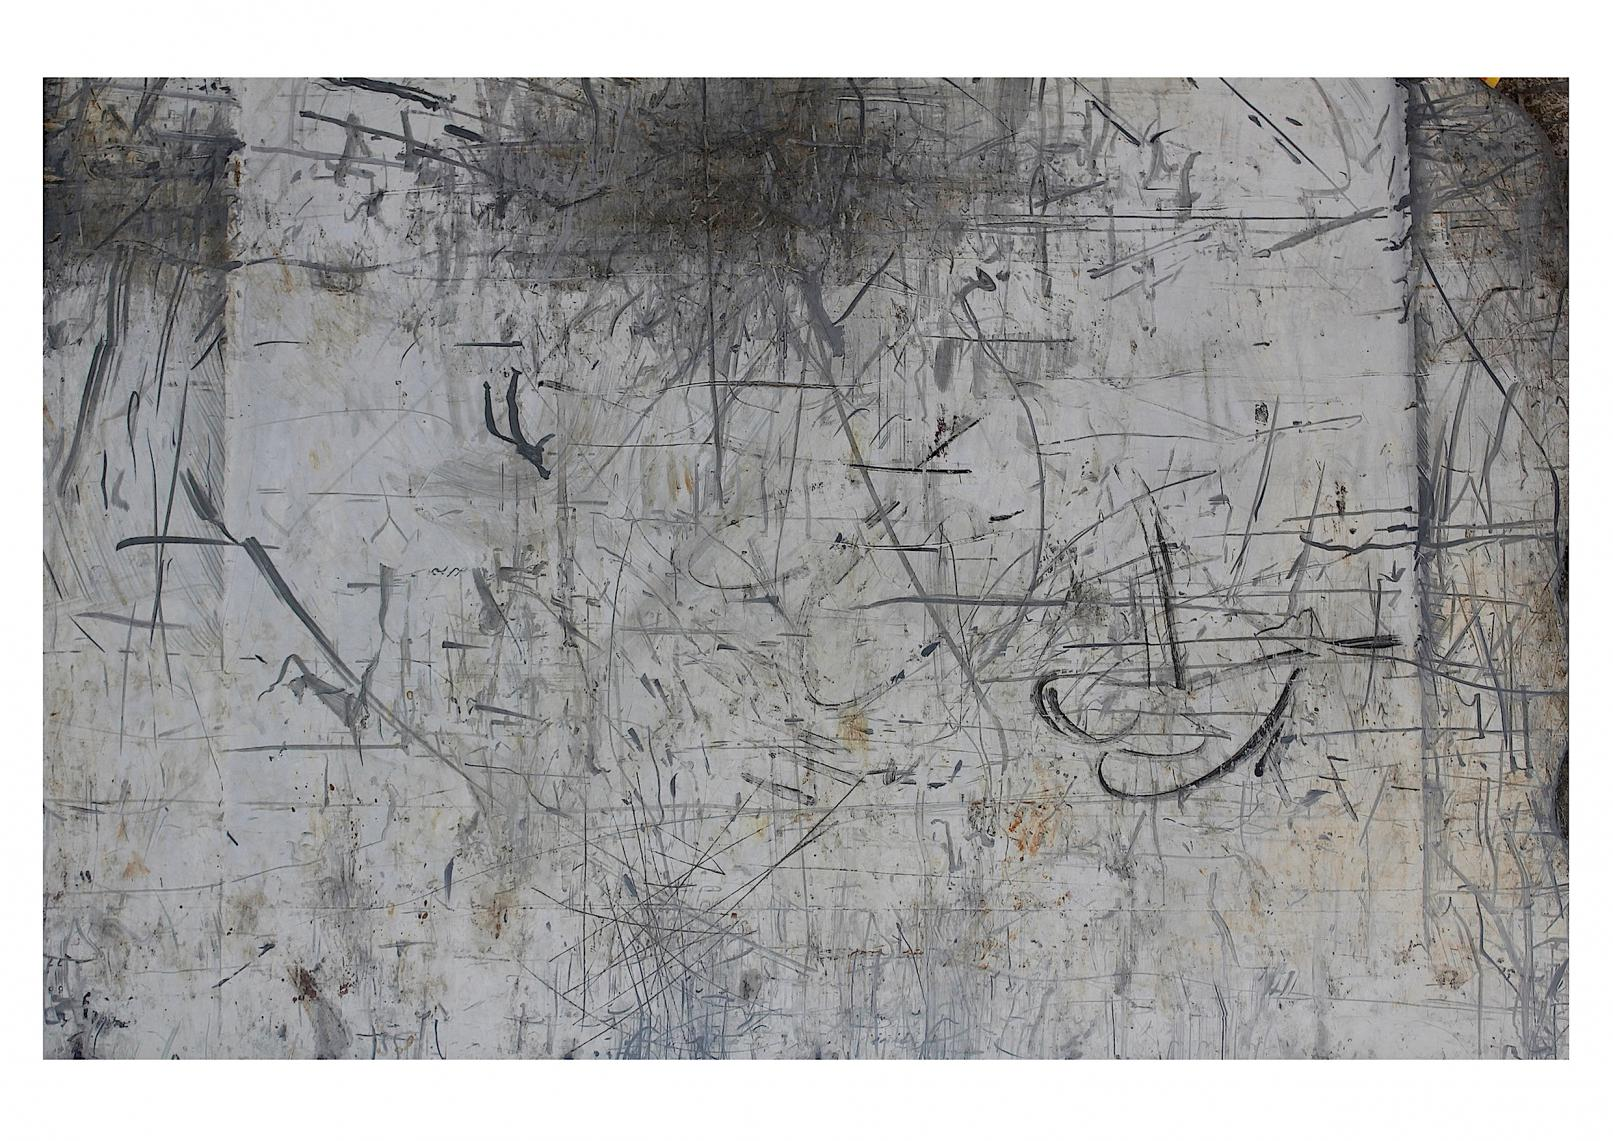 Vedado-Havana (Trash Painting VI) (2017) - David Beltrán